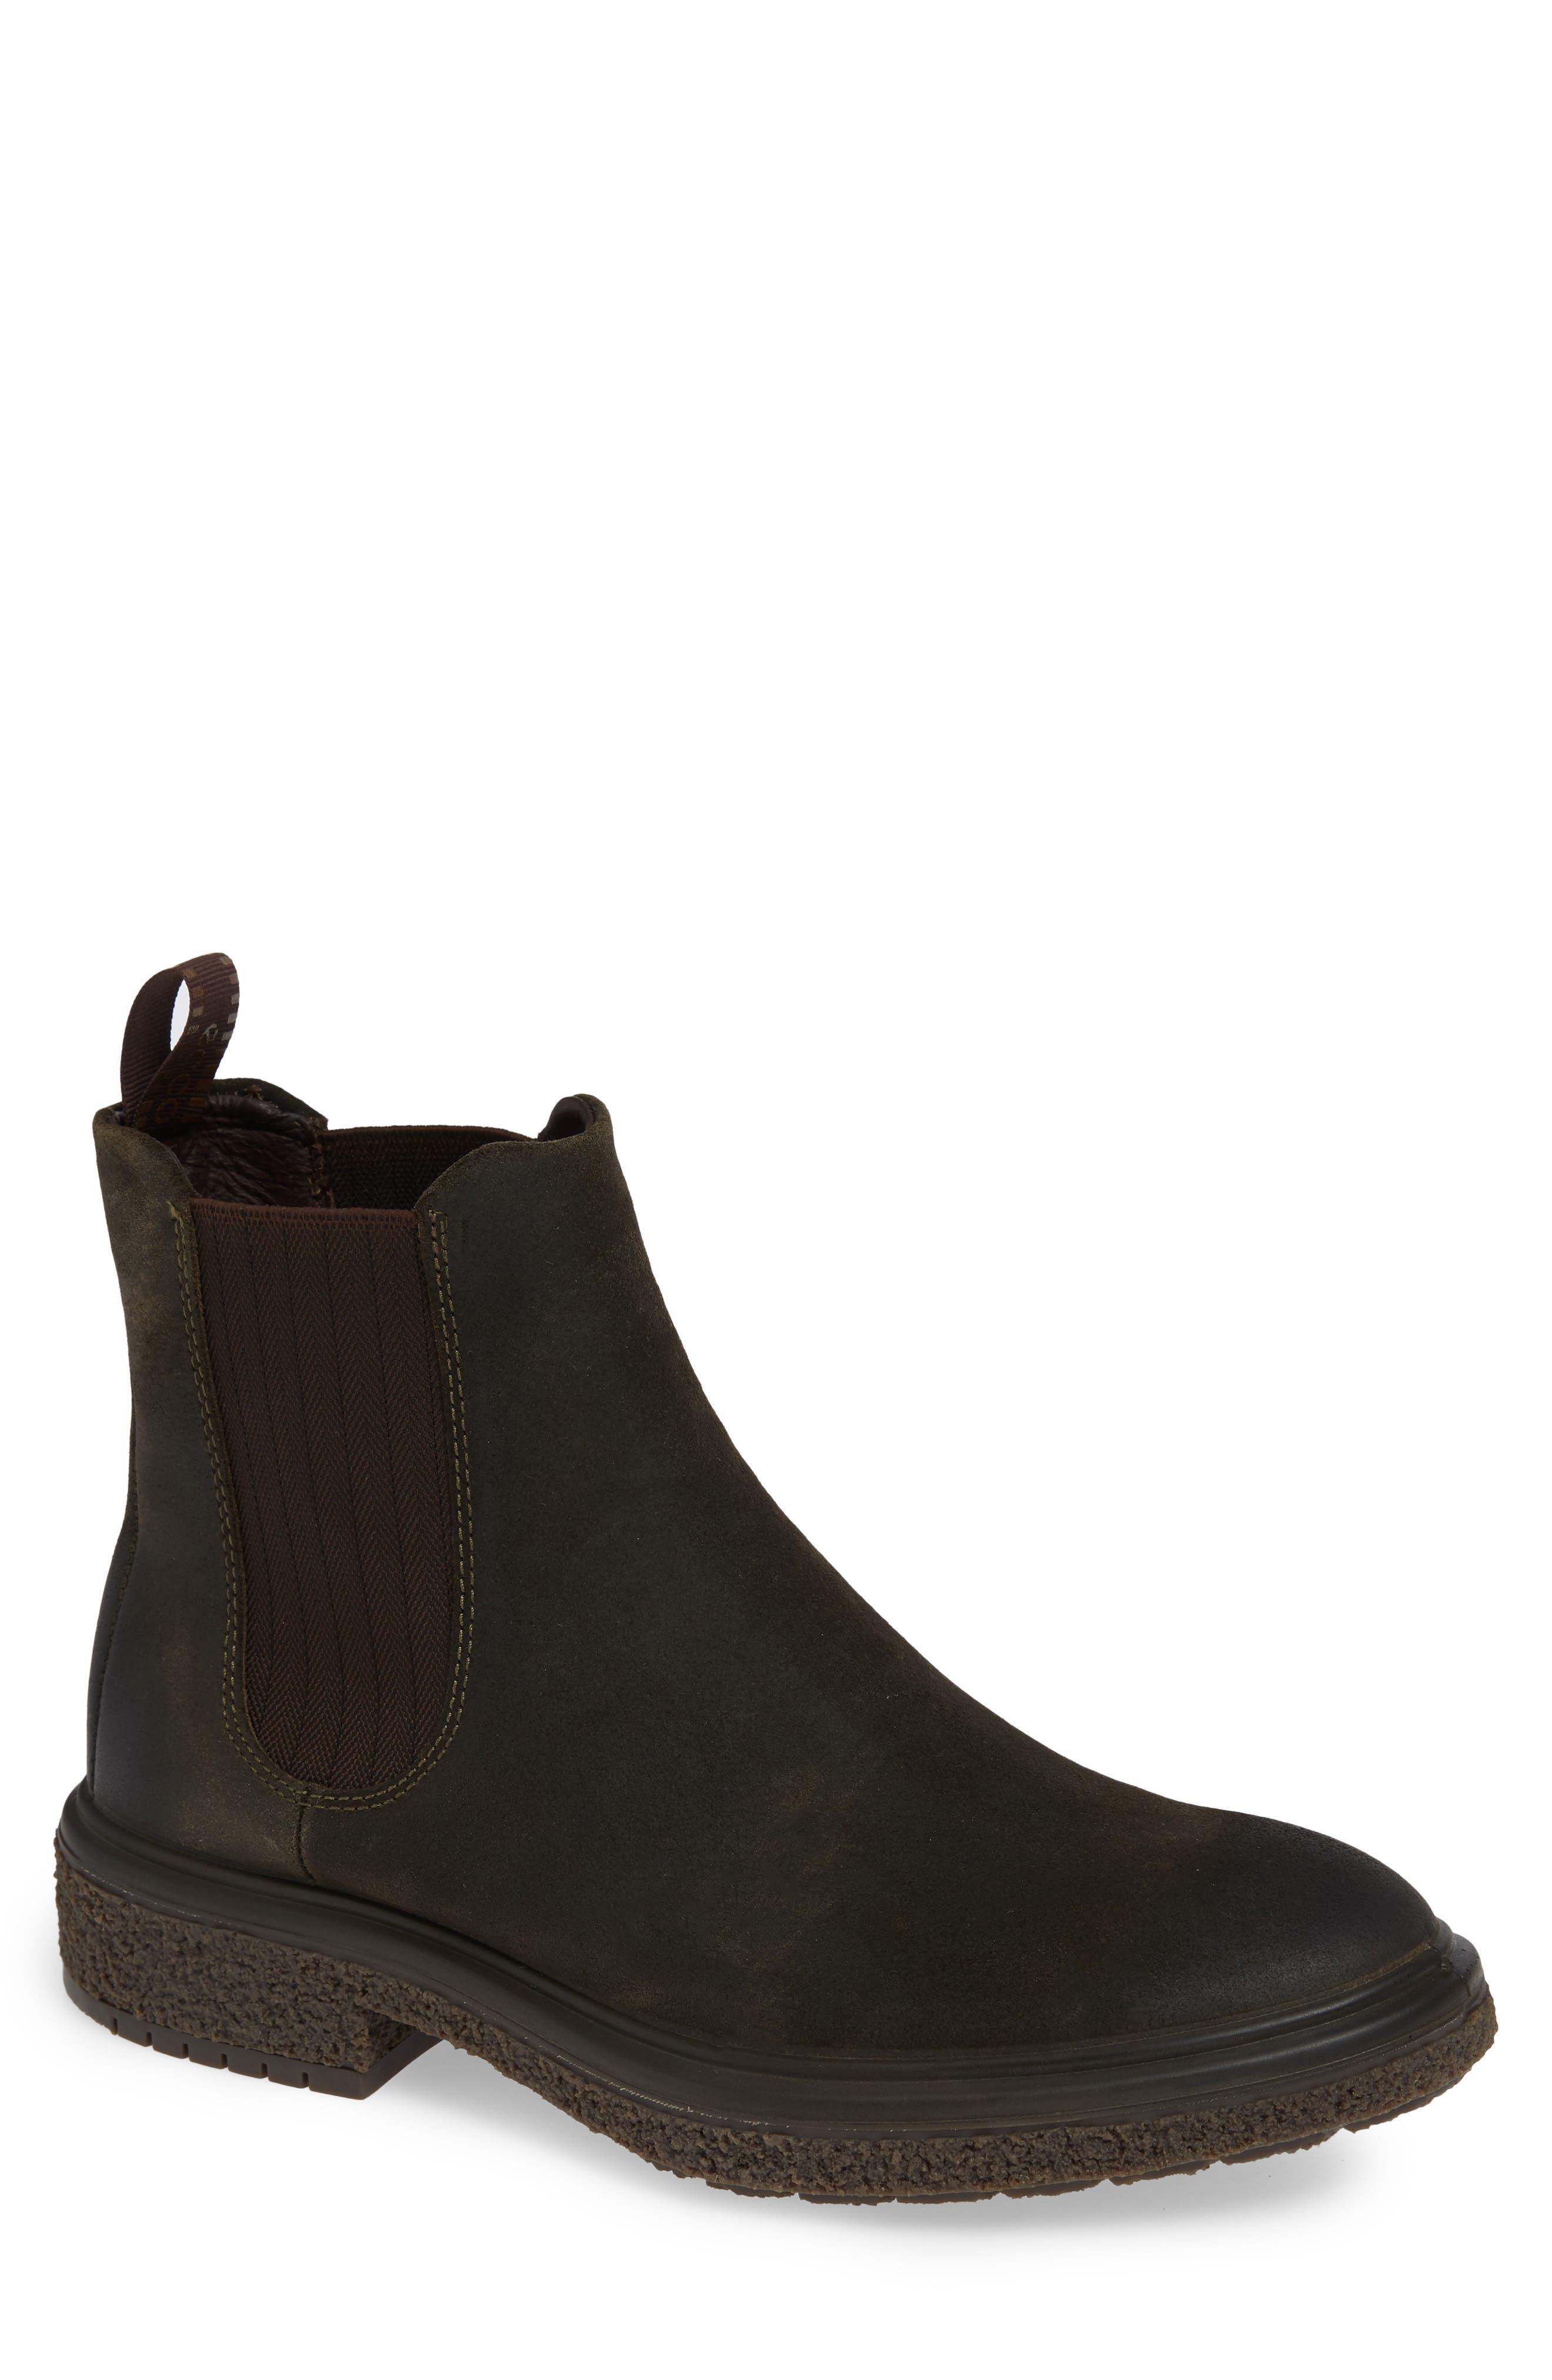 Crepetray Chelsea Boot,                         Main,                         color, TARMAC SUEDE